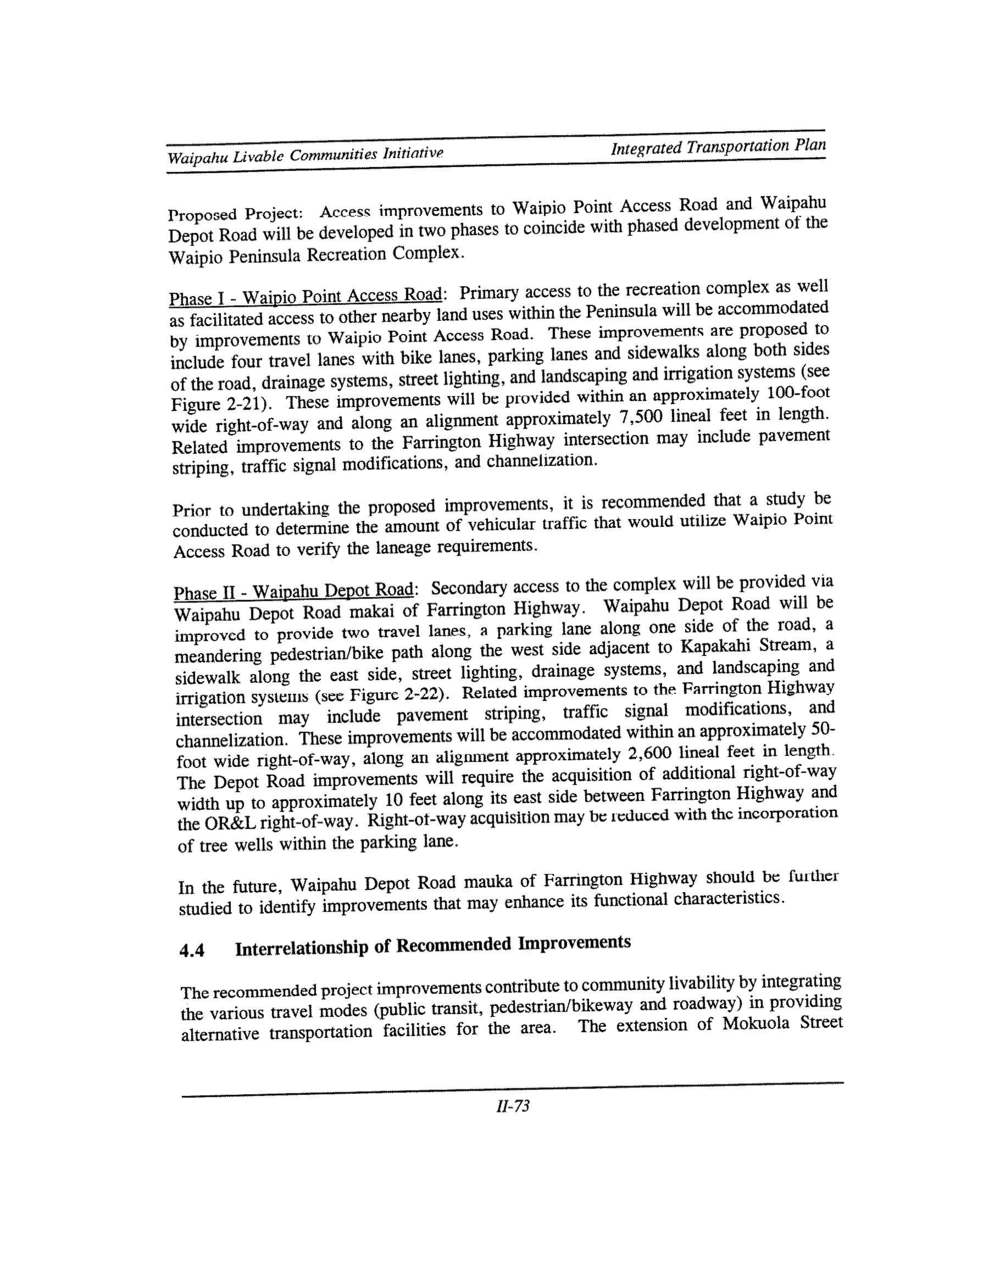 160531_WaipahuLivableCommunities(1998)_Page_088.jpg